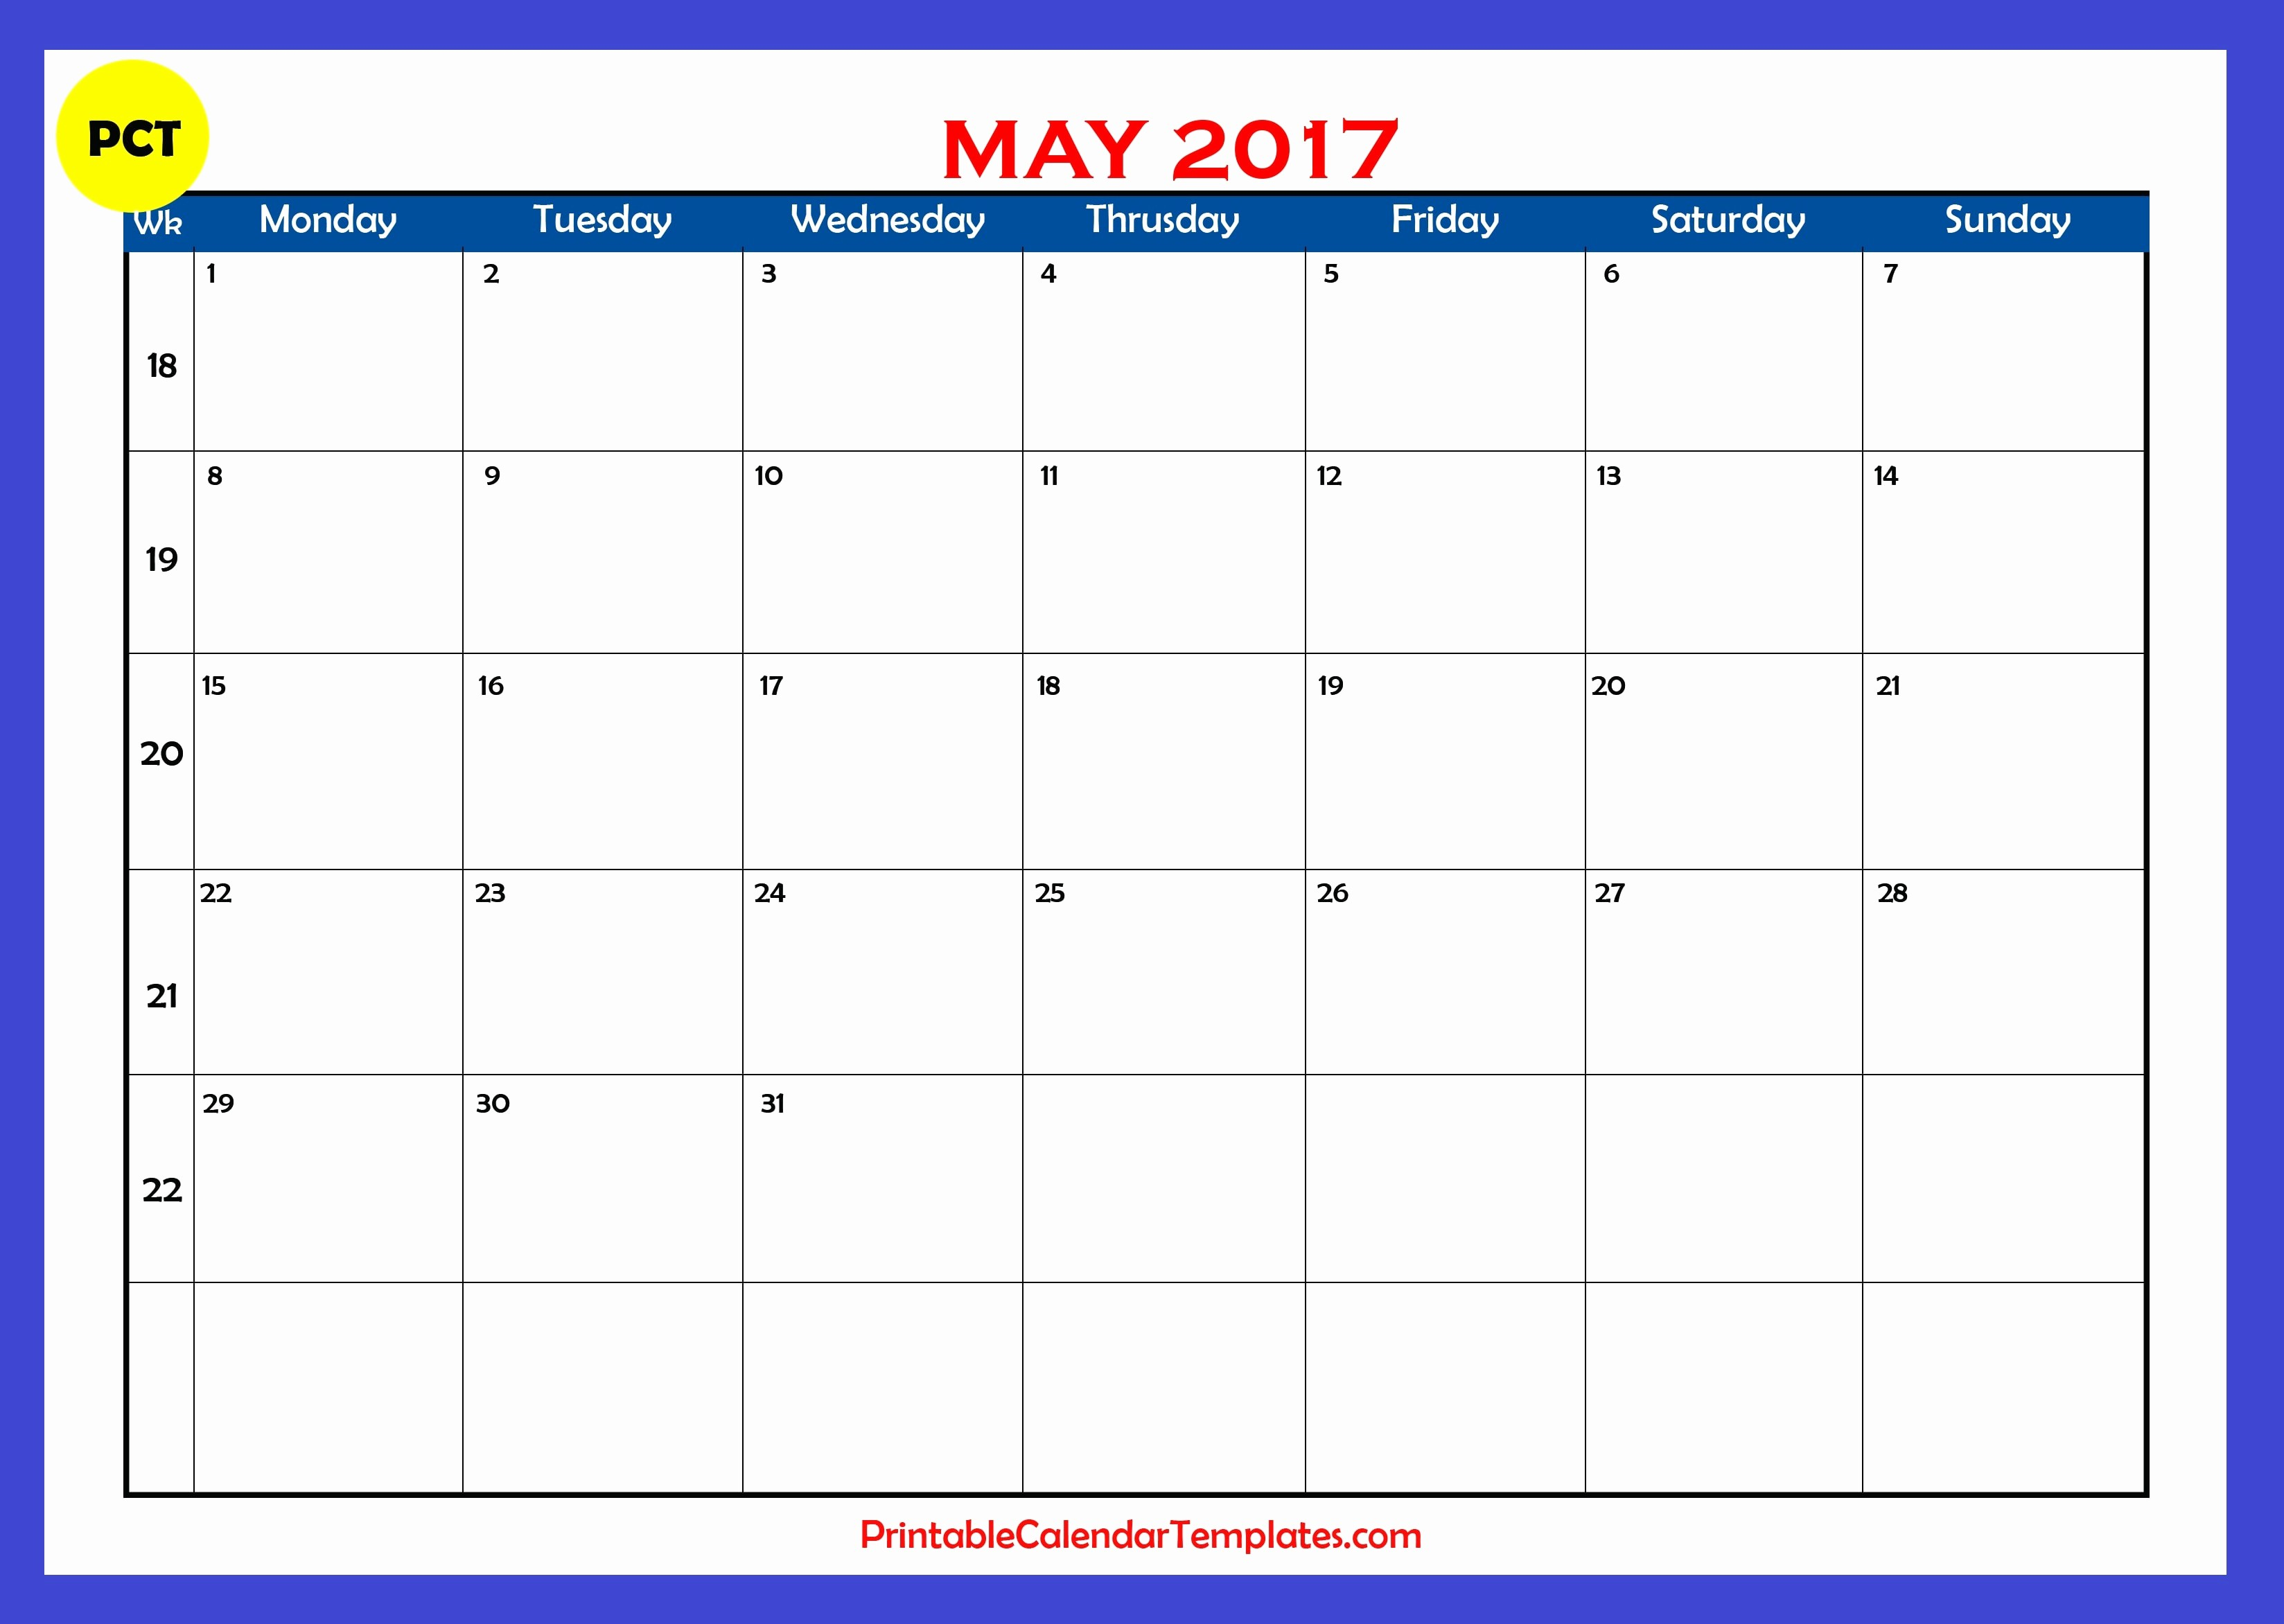 Blank May Calendar 2017 Printable Inspirational [free] Printable Calendar Templates 2016